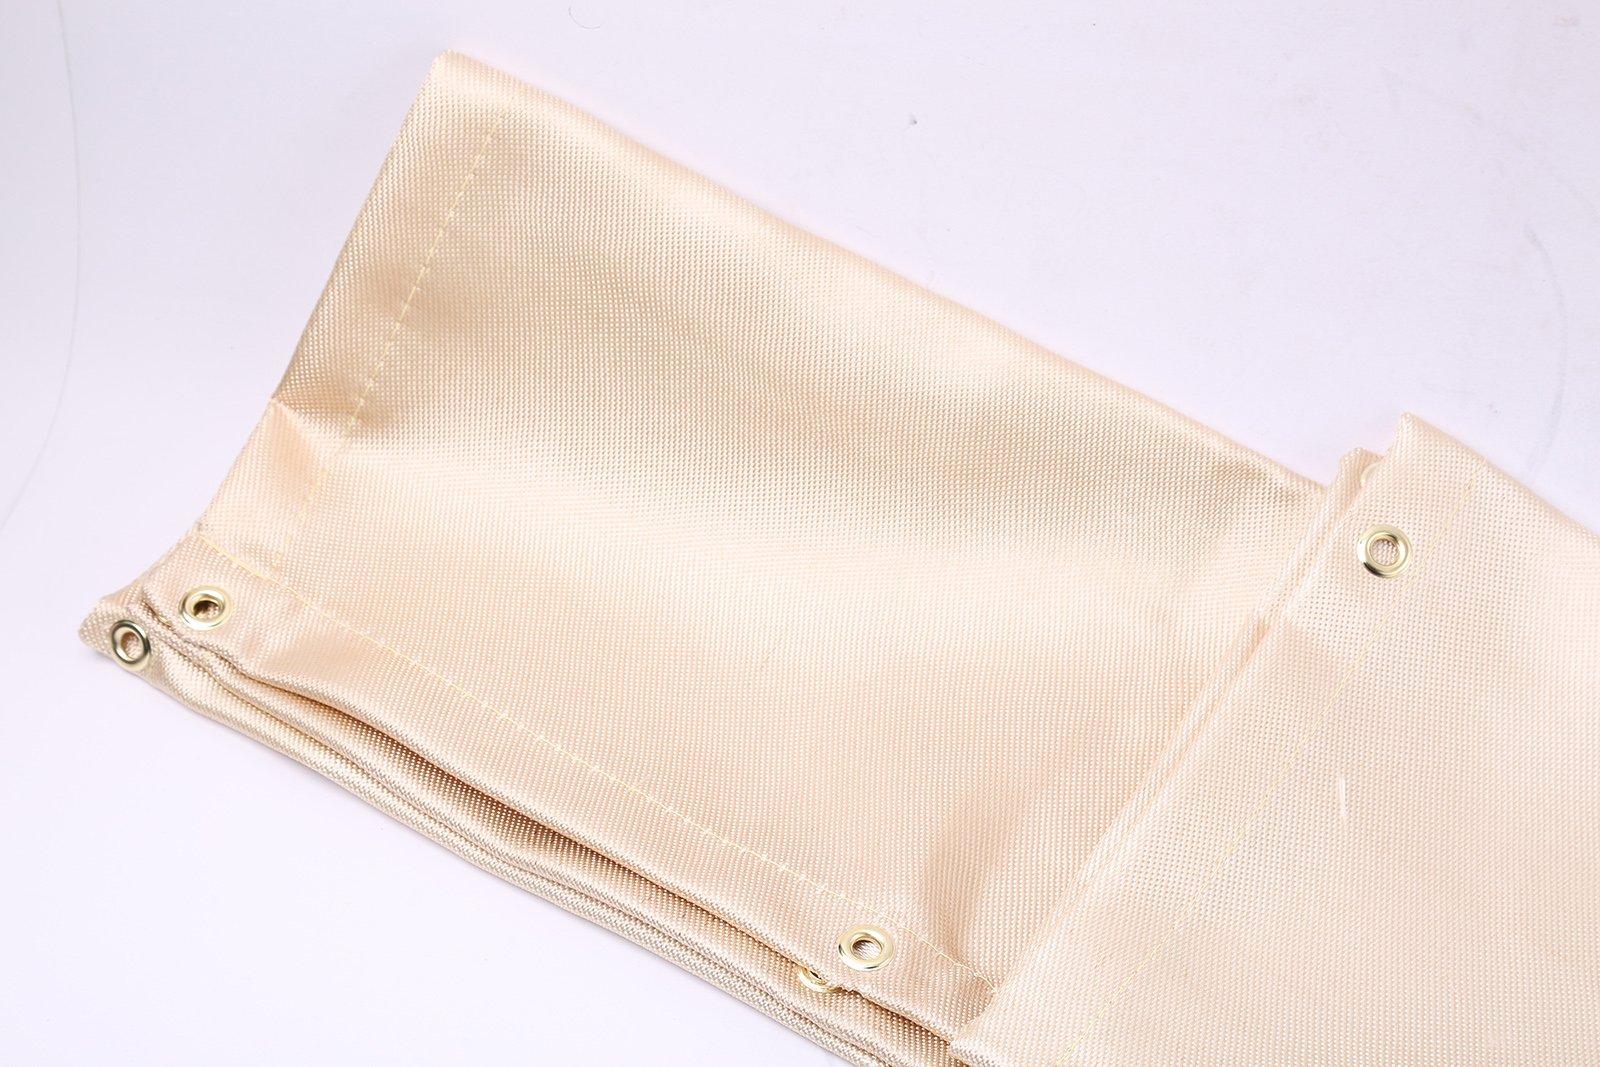 4 Feet x 6 Feet Welding Blanket Fire Flame Retardant Fiberglass Safety Shield Grommets by WINTOOLS